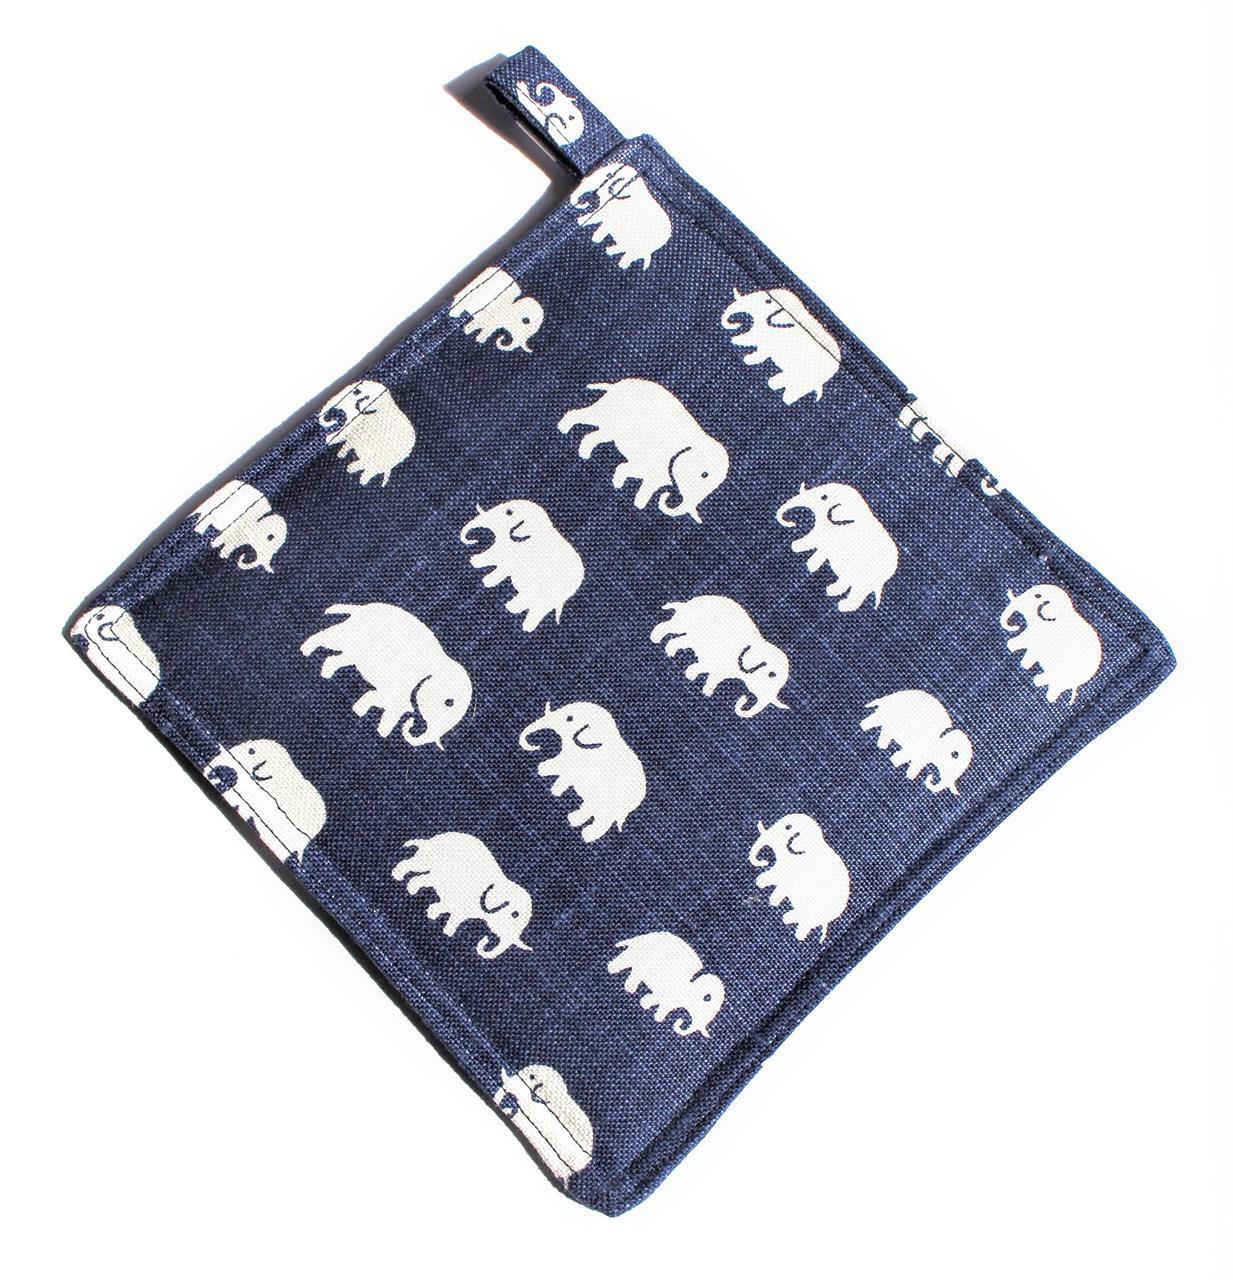 Grytlapp stormblå med elefanter